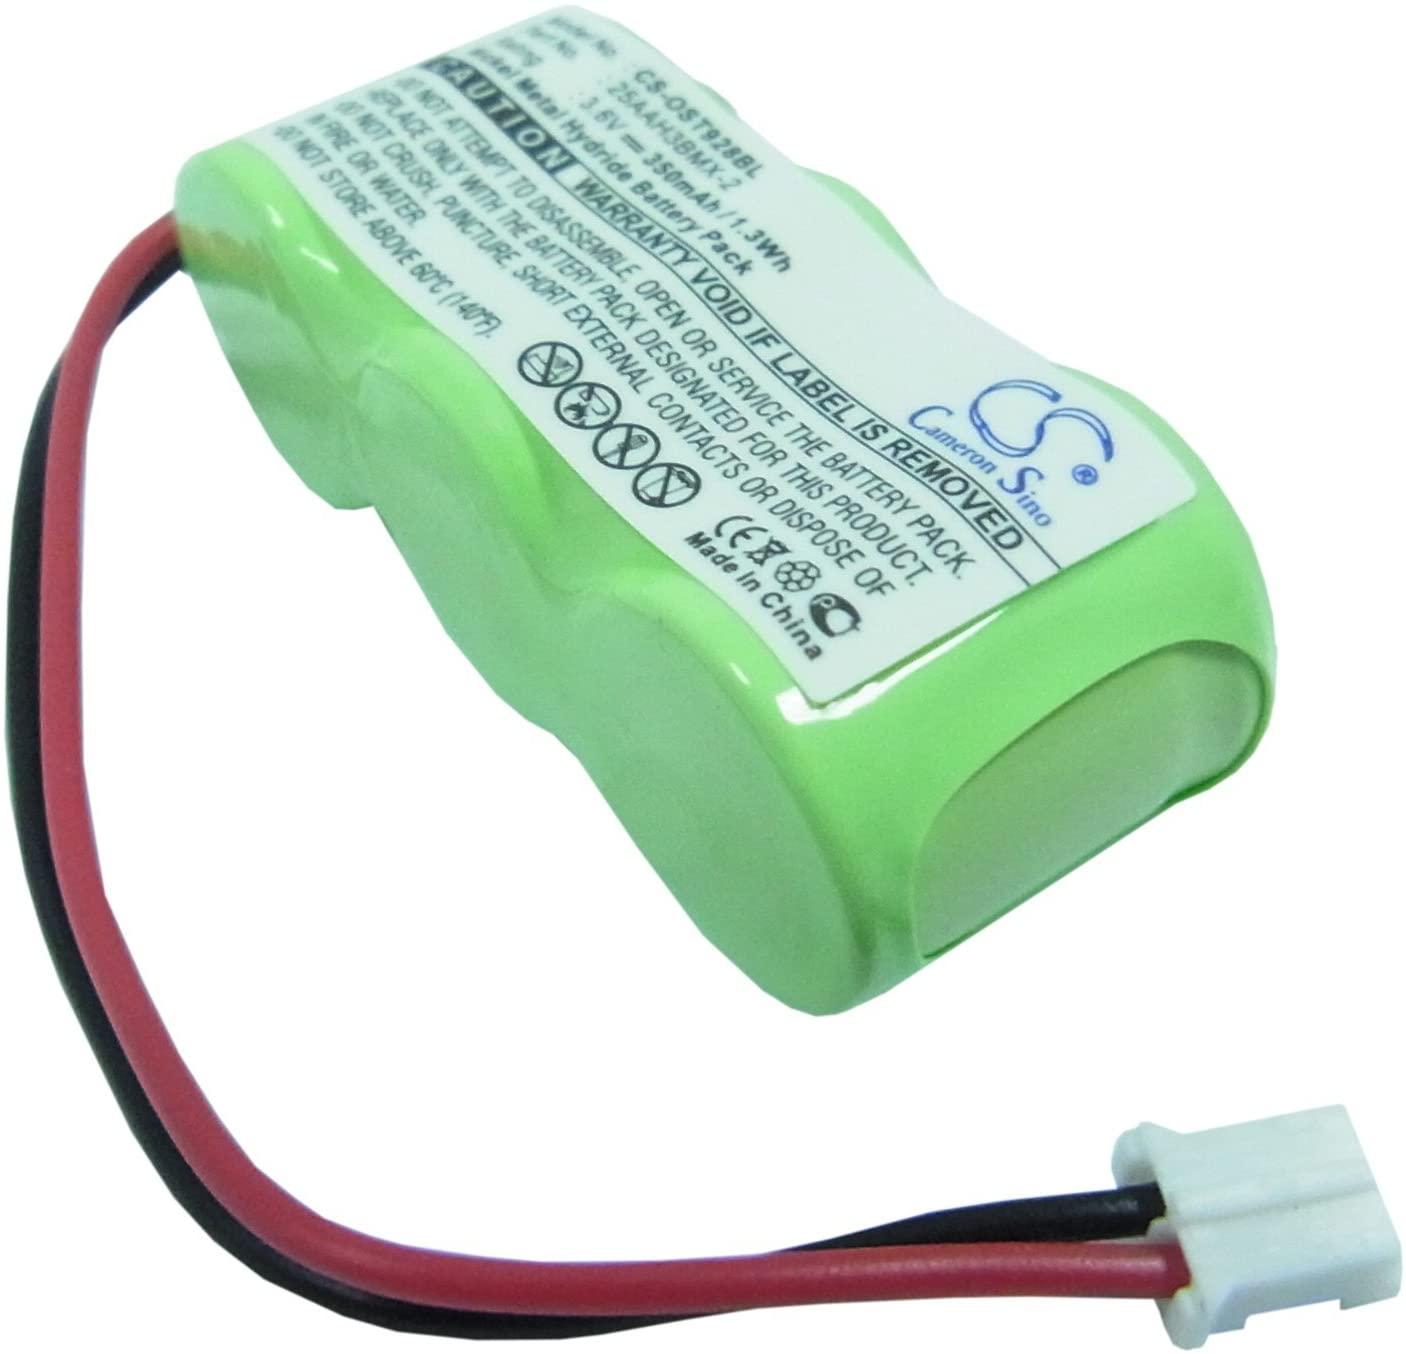 350mAh Battery Replacement for Oregon Scientific STR918, STR928, STR938, STR968, P/N 25AAH3BMX-2, CUSTOM-178